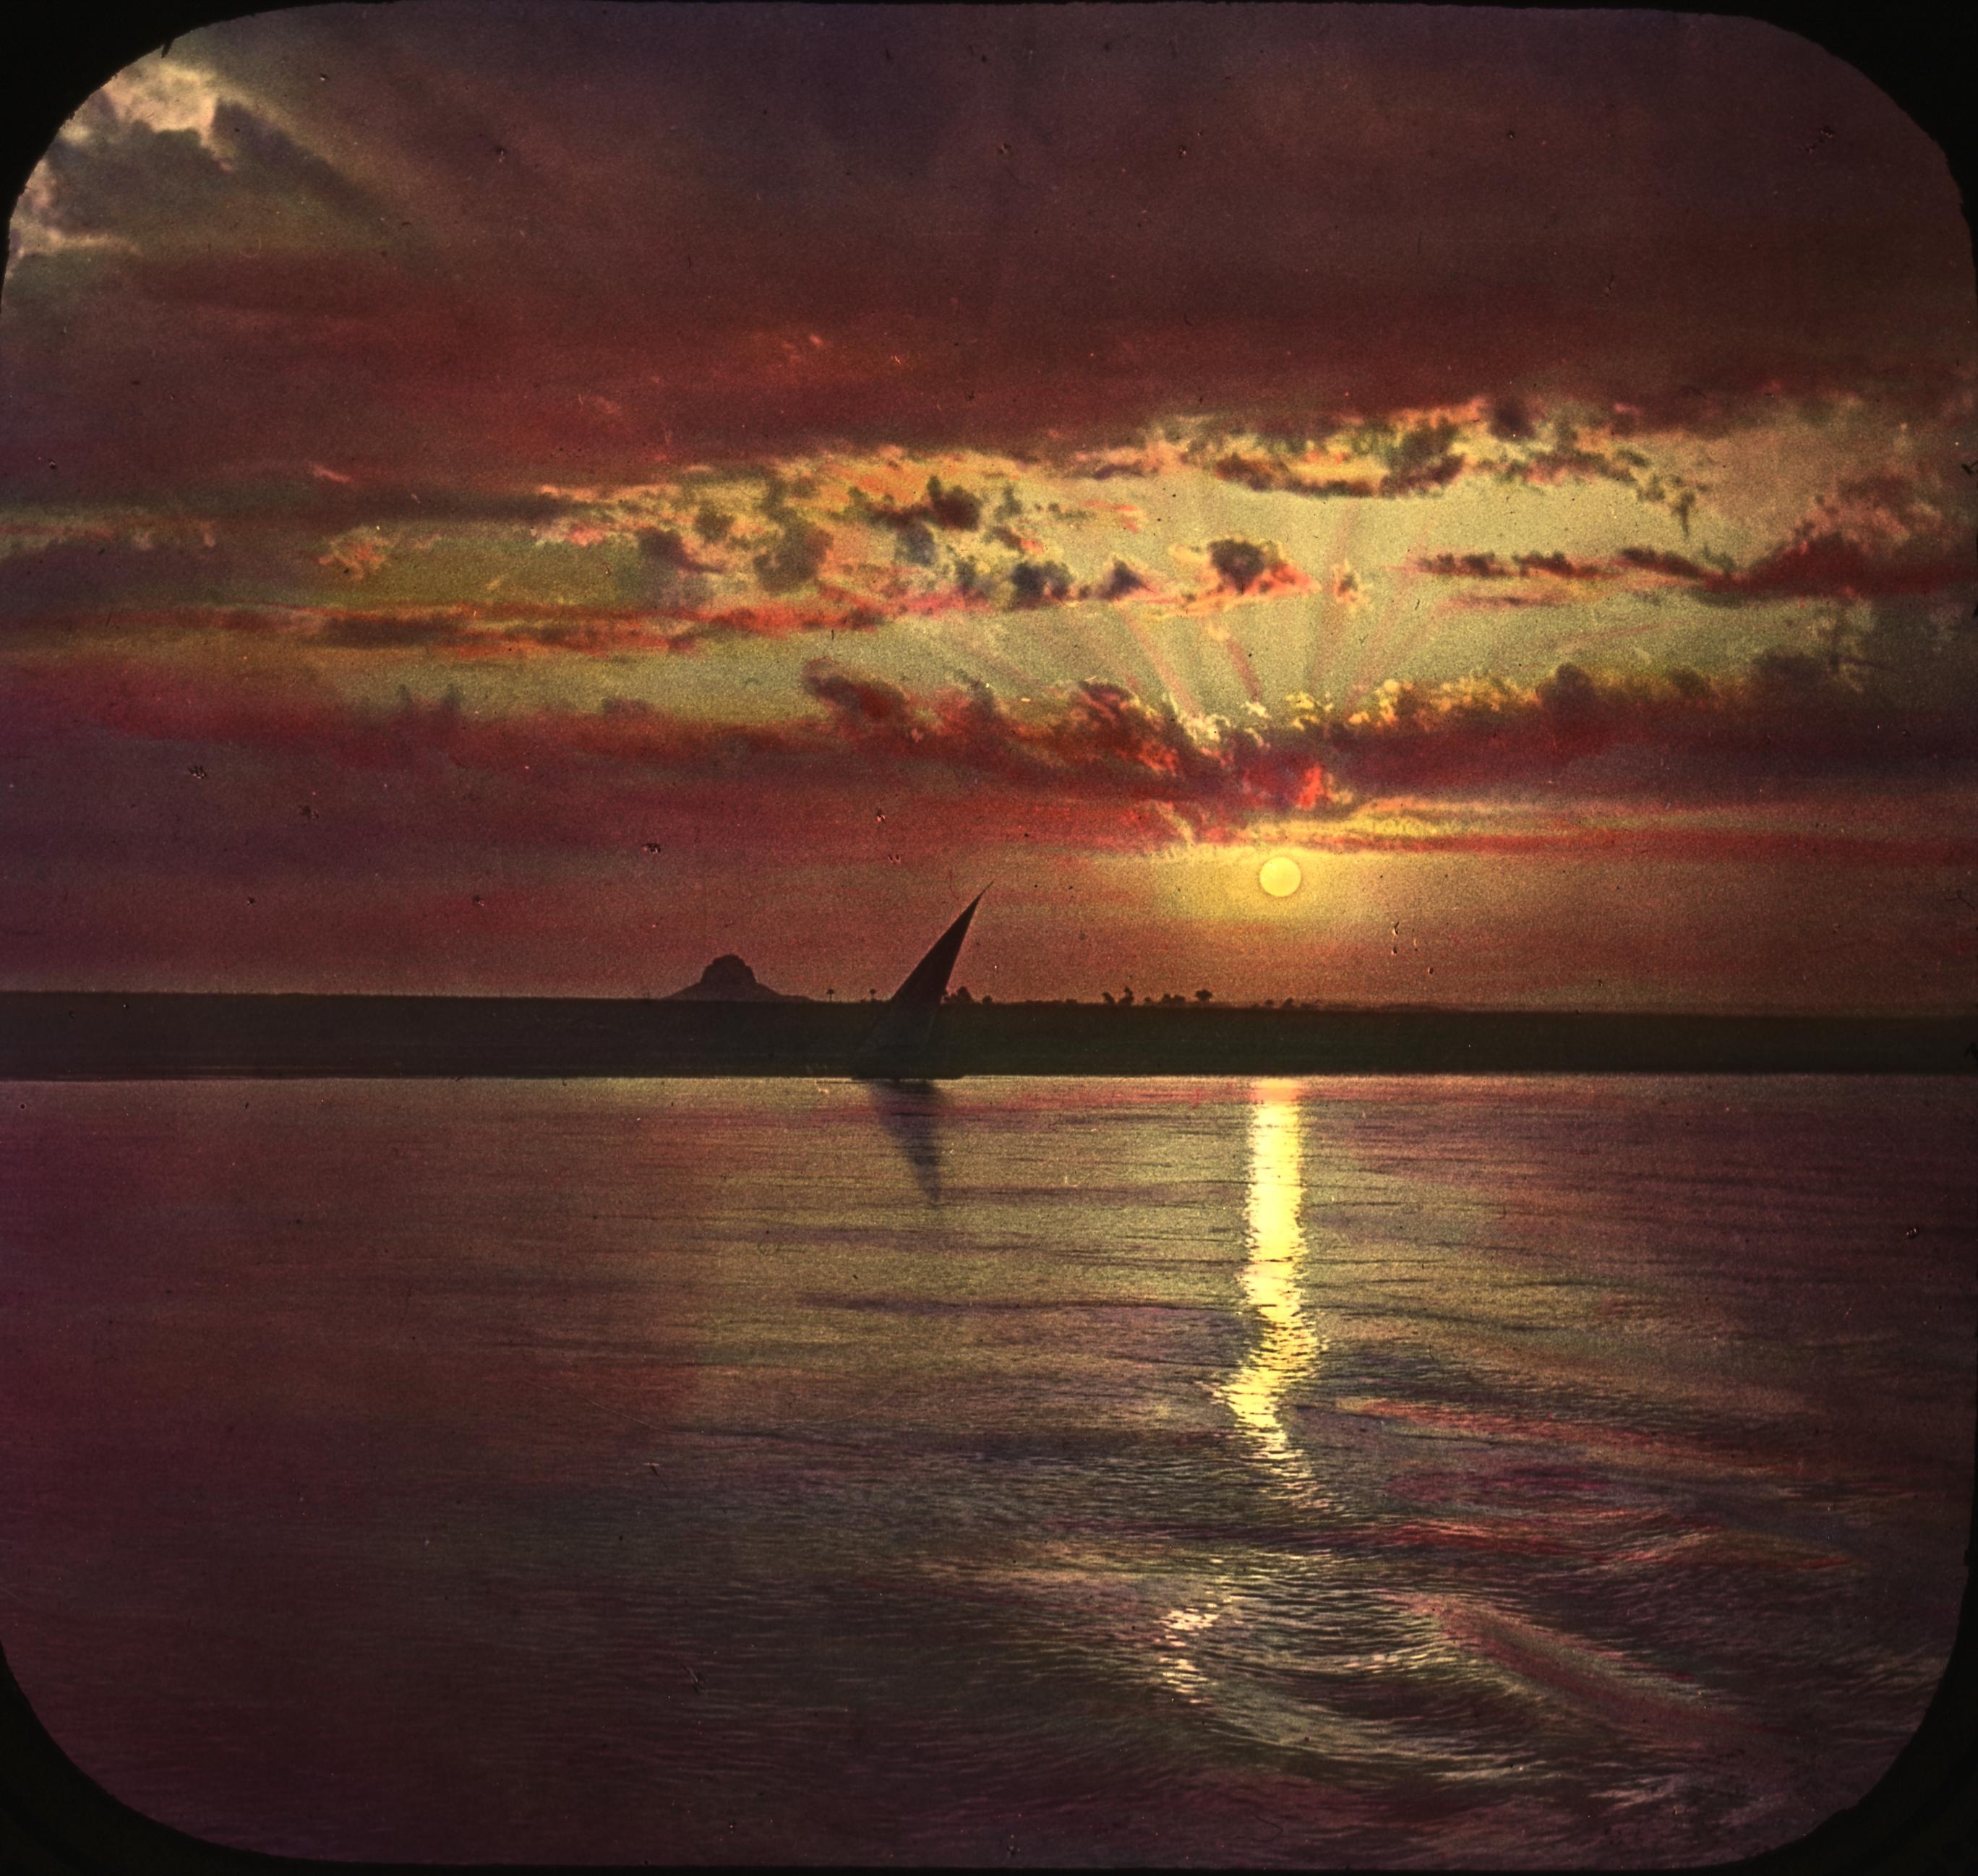 FileEgypt Sunset On The Nilejpg Wikimedia Commons